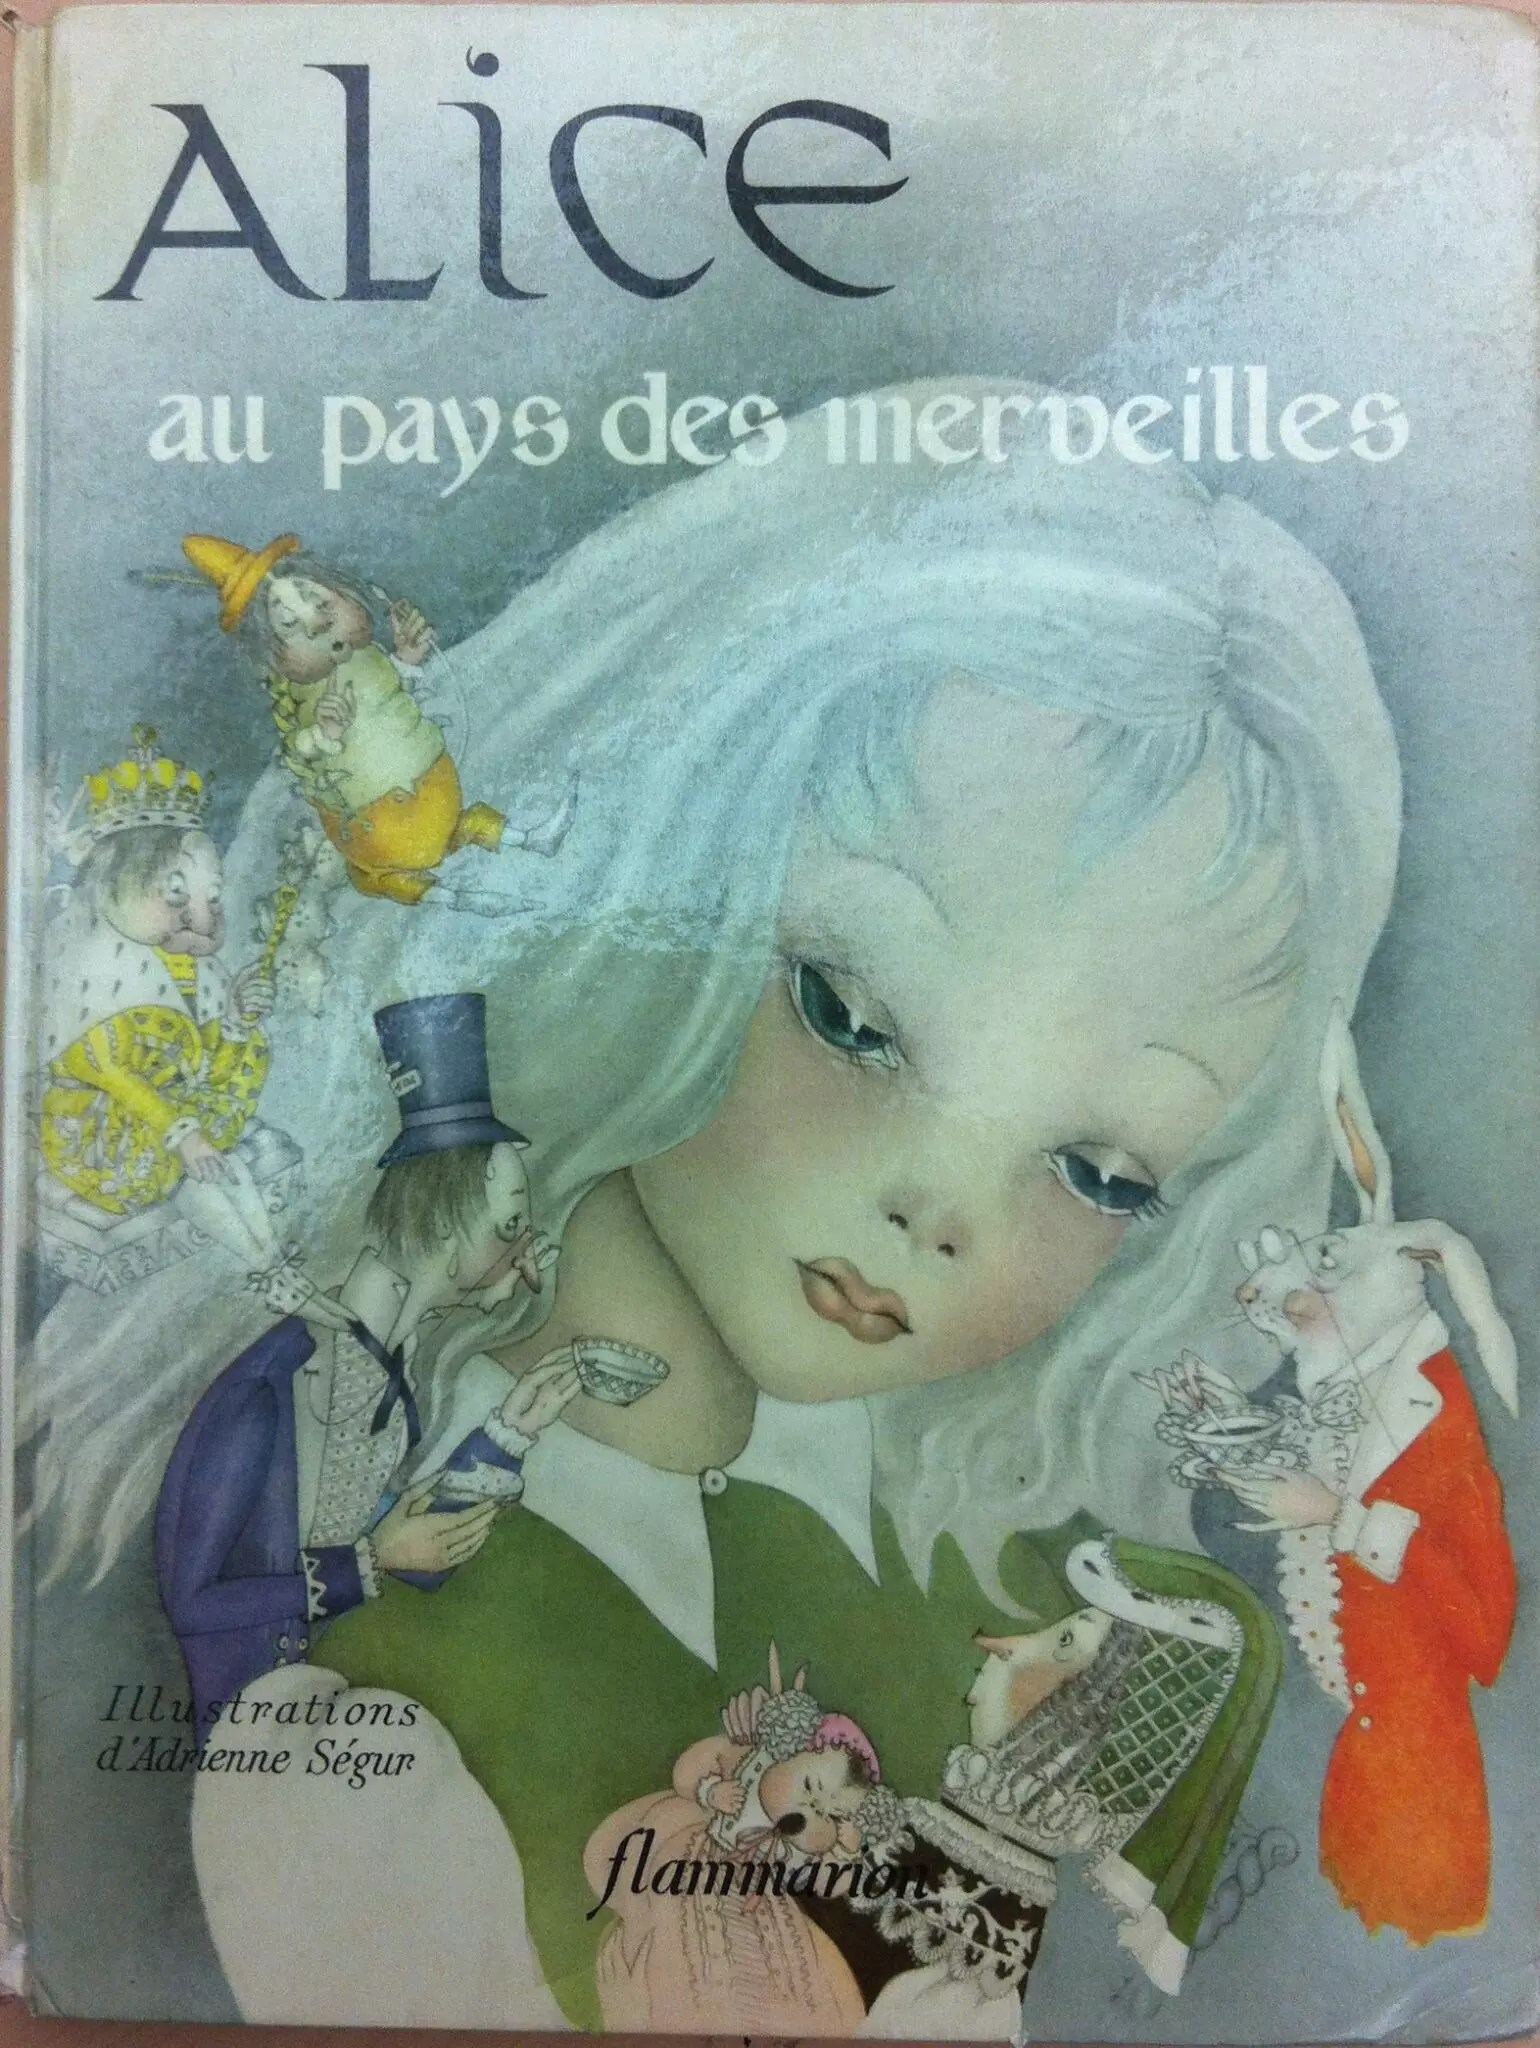 Alice by Adrienne Segur